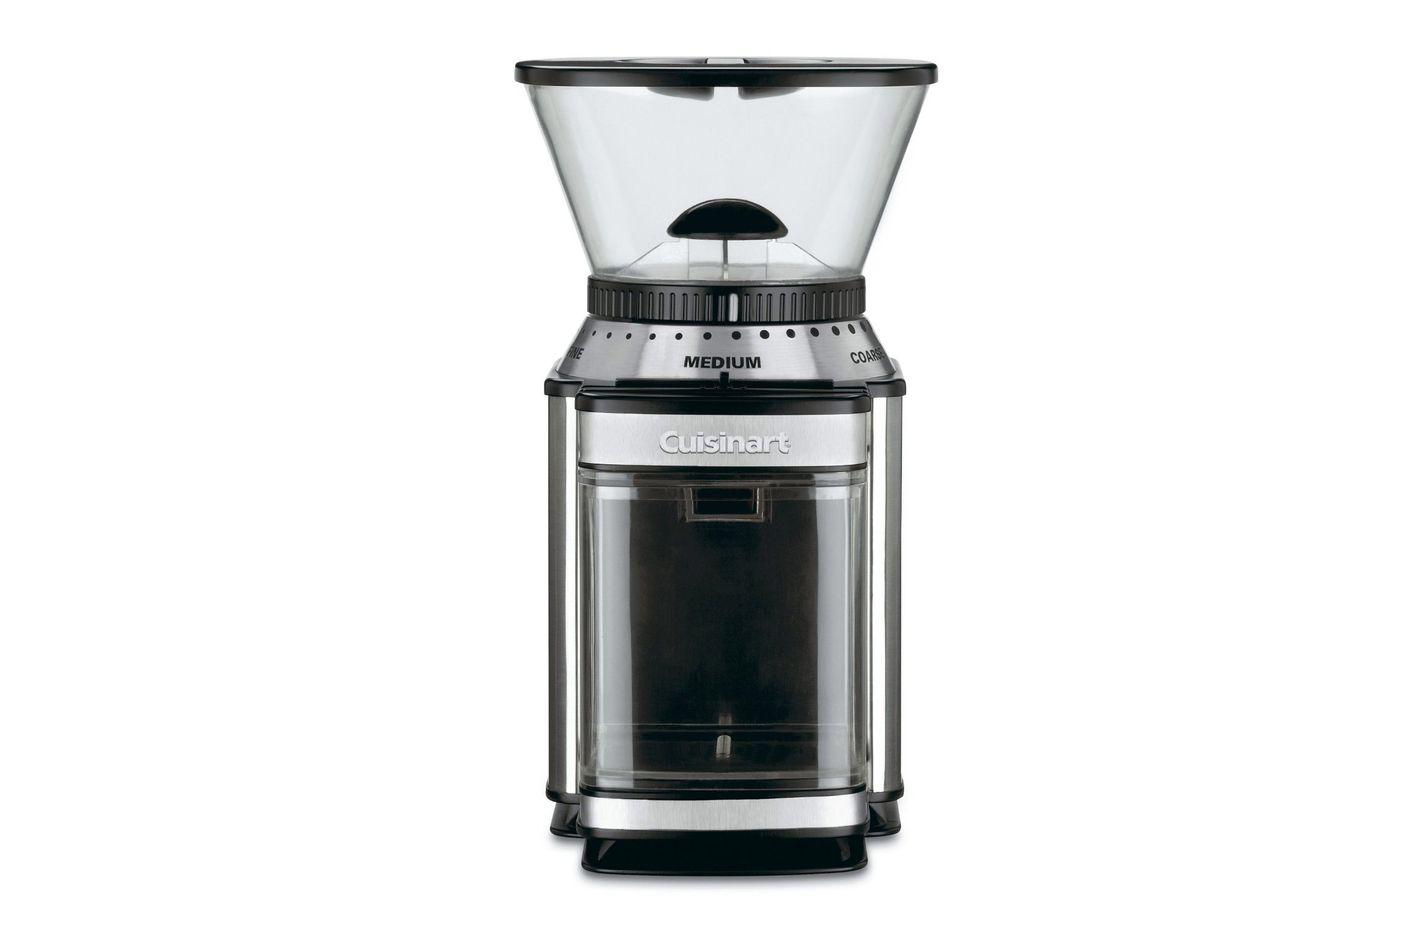 Cuisinart DBM-8 Automatic Burr Mill